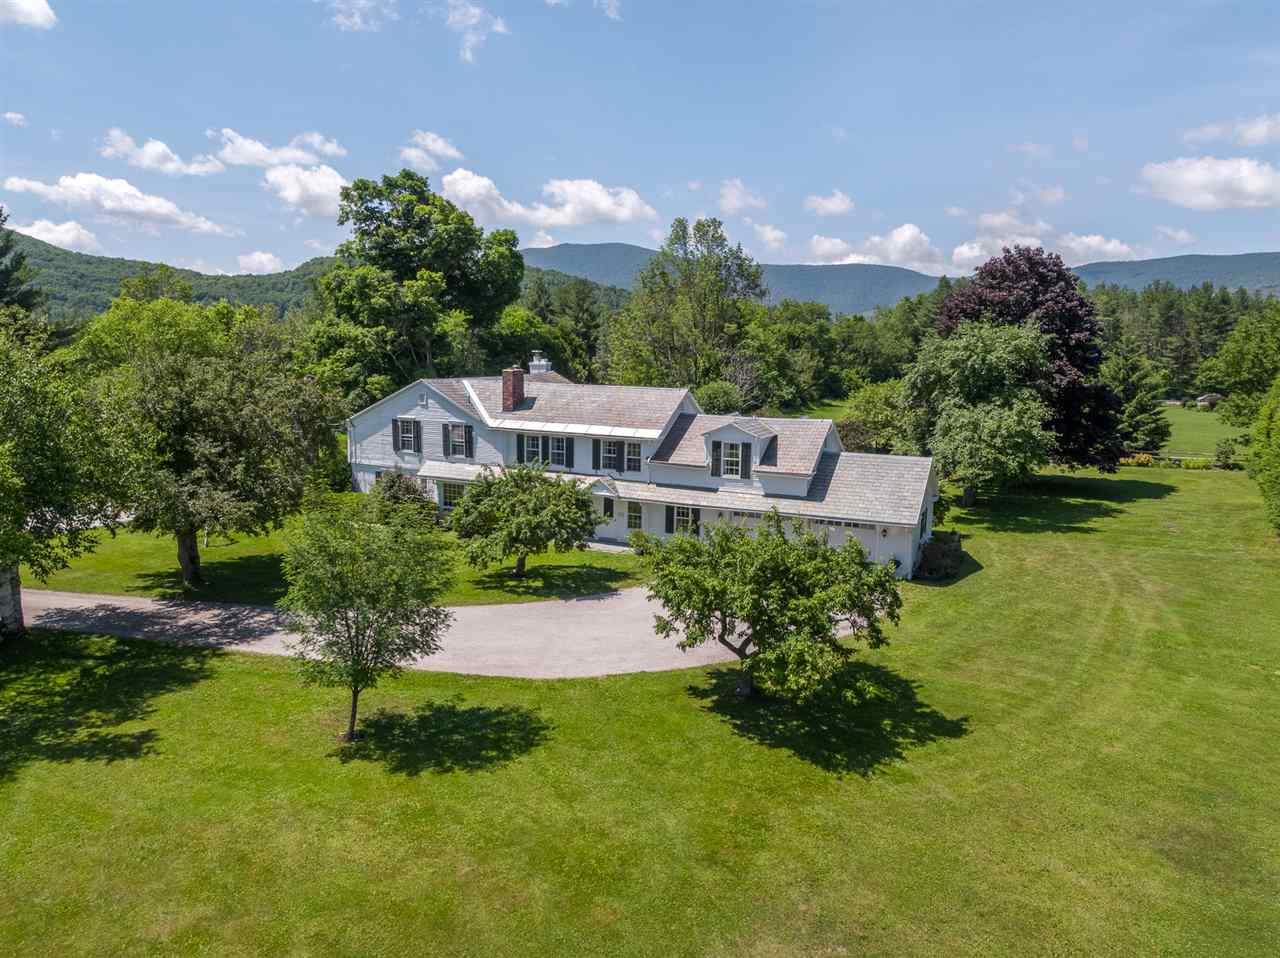 Dorset VTHorse Farm | Property